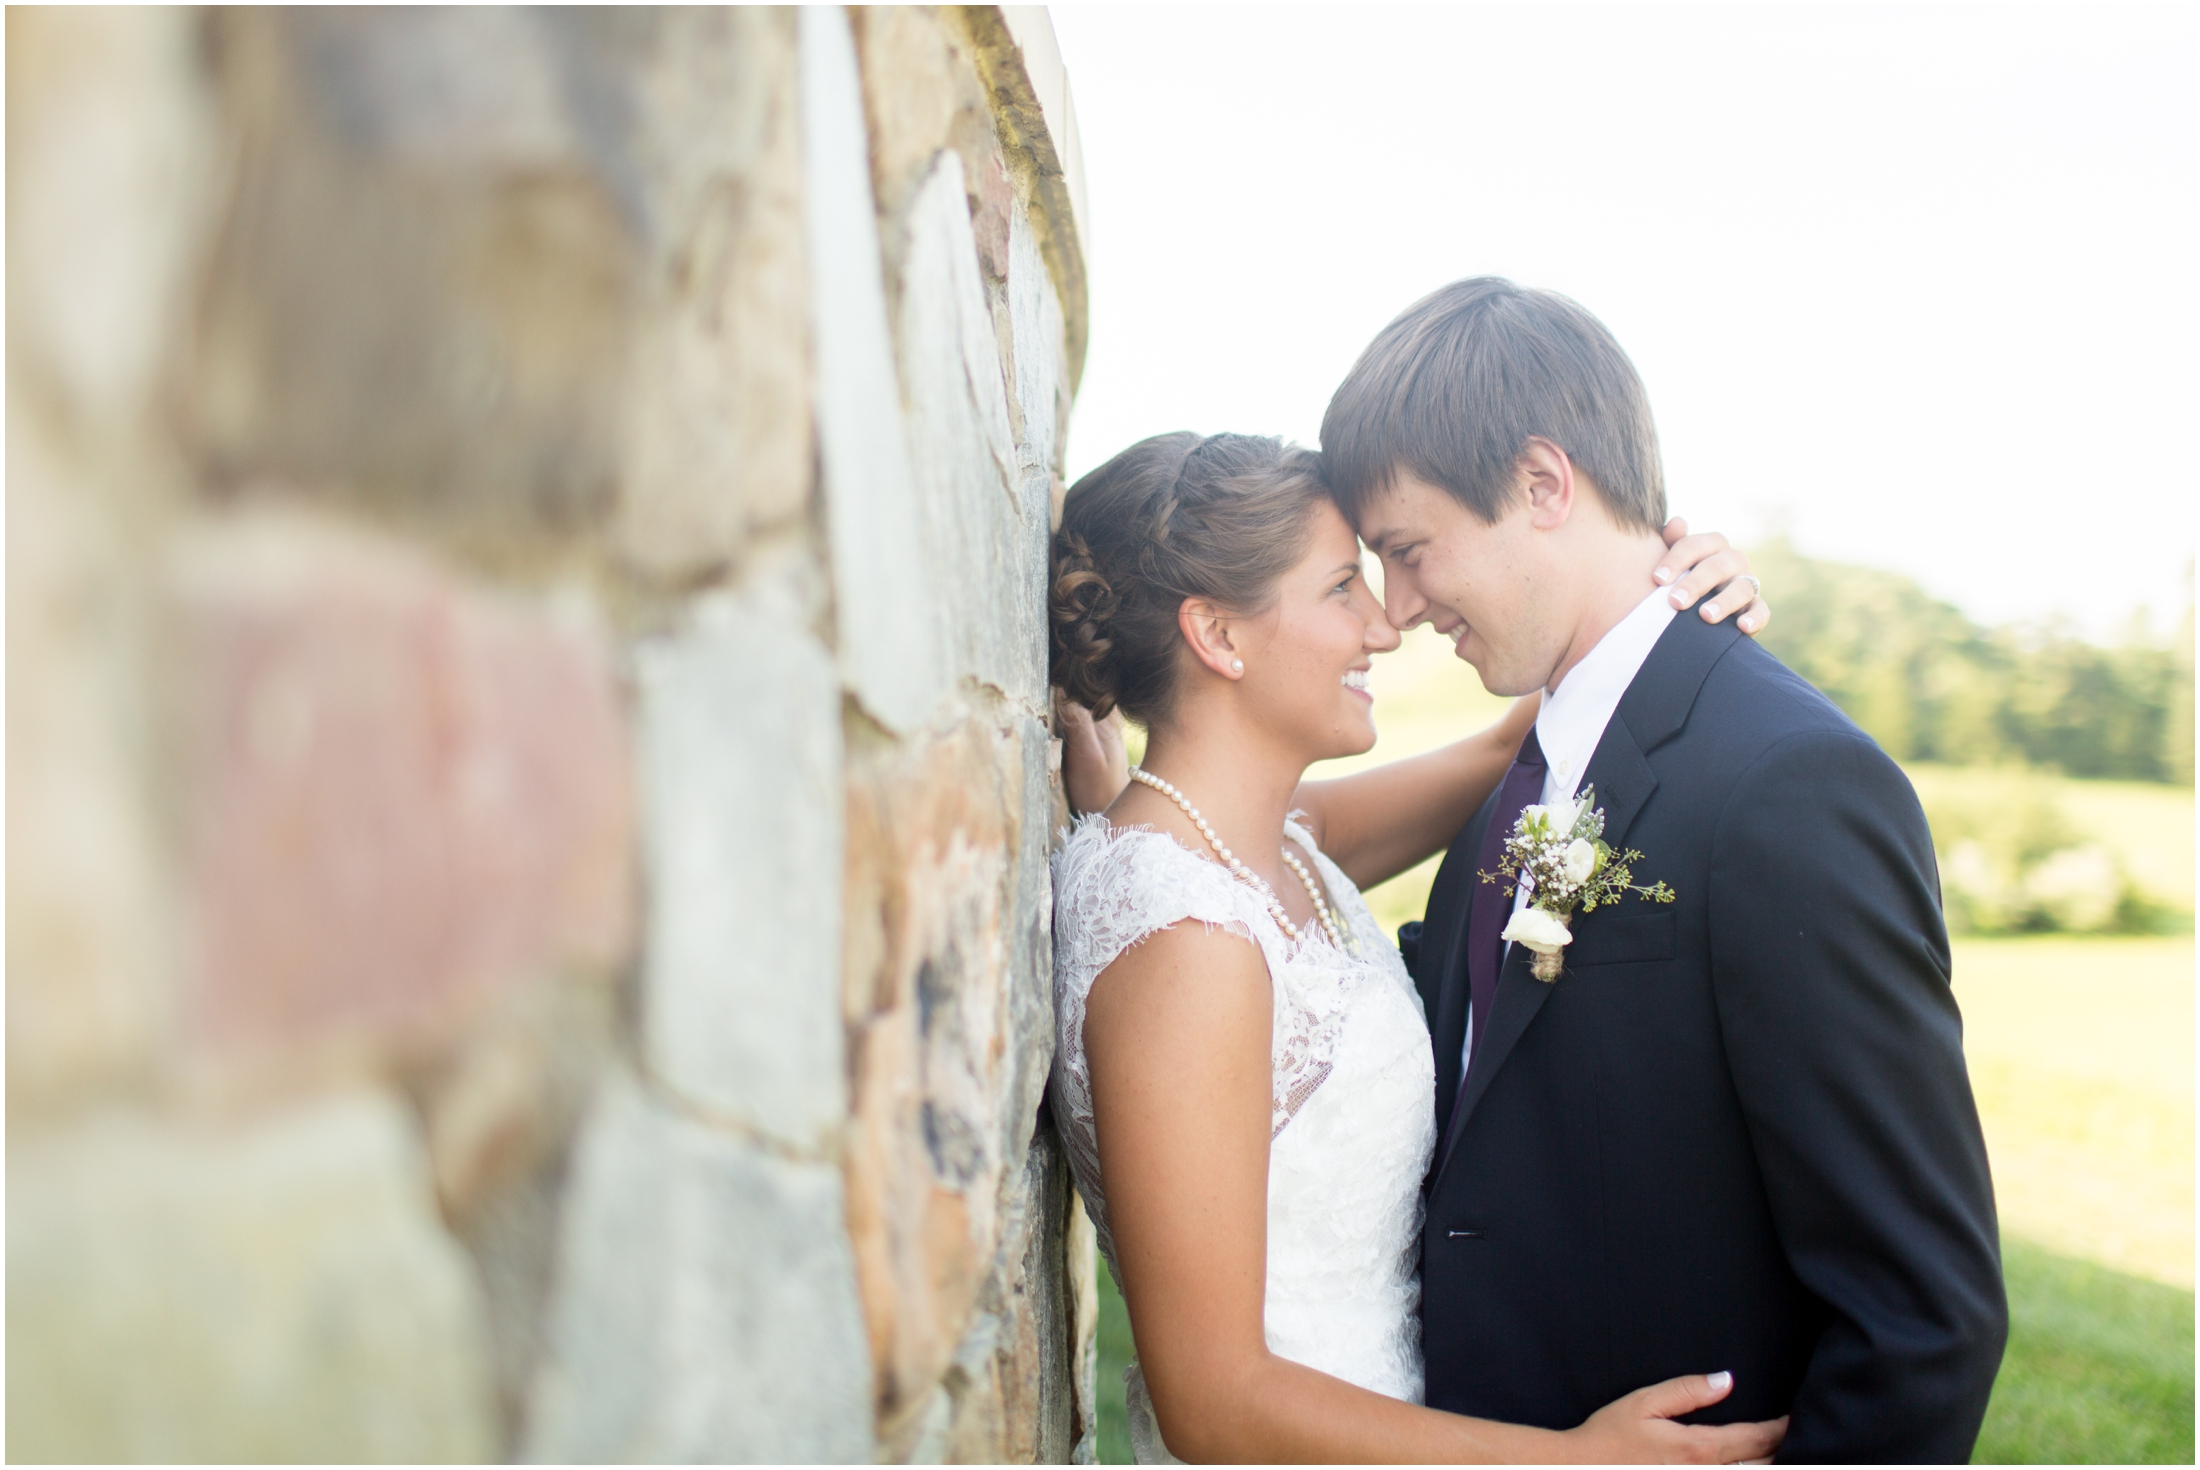 Norton-Wedding-3-Bride-and-Groom-Portraits-1052.jpg